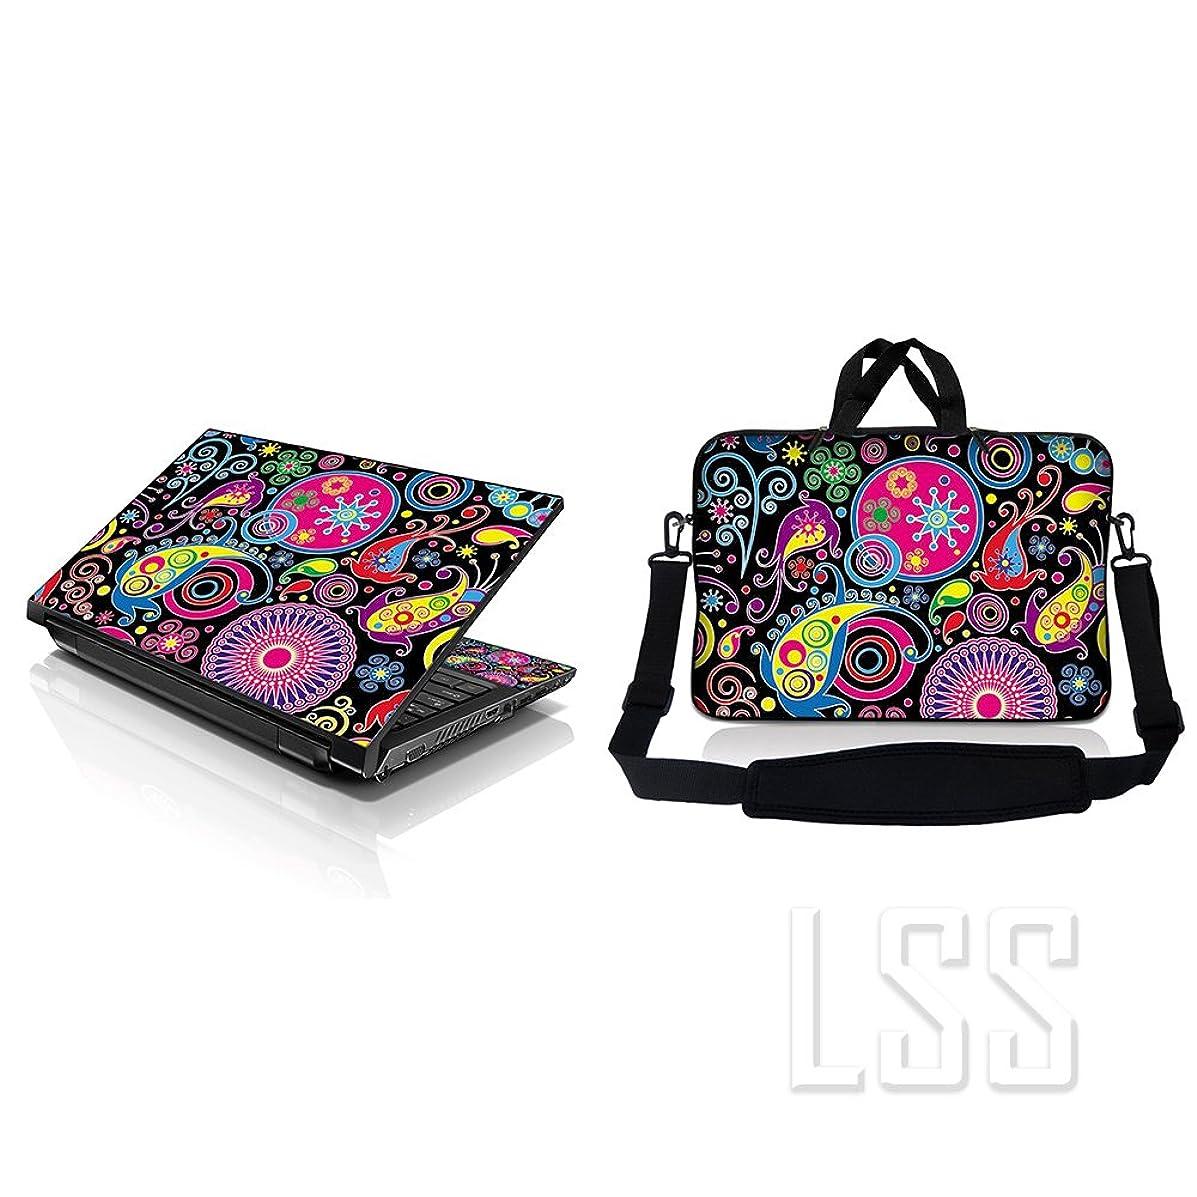 Laptop & MacBook PRO Sleeve Bag Carrying Case w/Handle & Adjustable Shoulder Strap & Matching Skin Sticker Fits 15